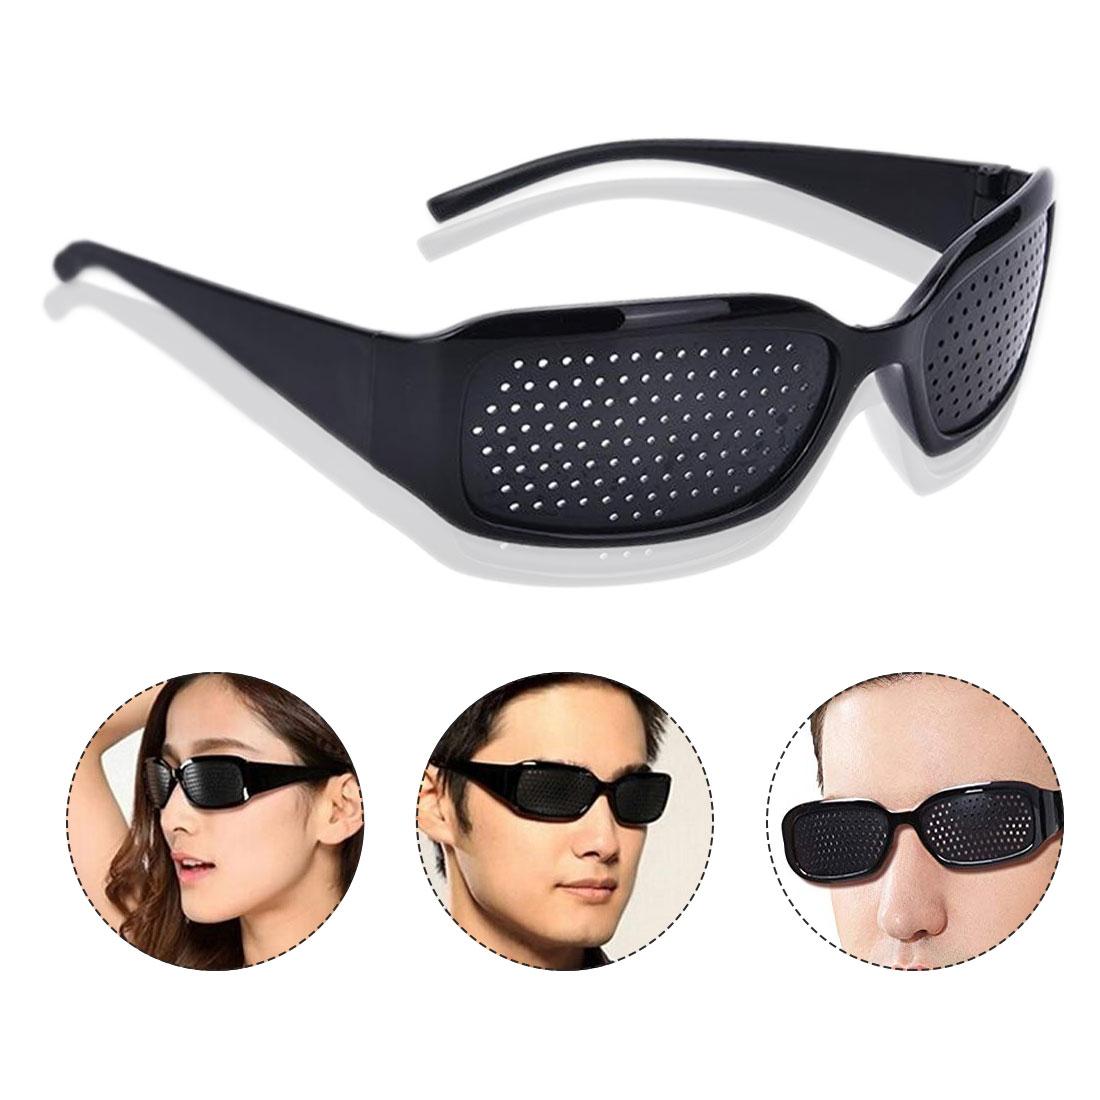 Fatigue Relieve Glasses Pinhole Anti-fatigue Eye Care Vision Care Eyeglasses Unisex Eyesight Exercise Protective